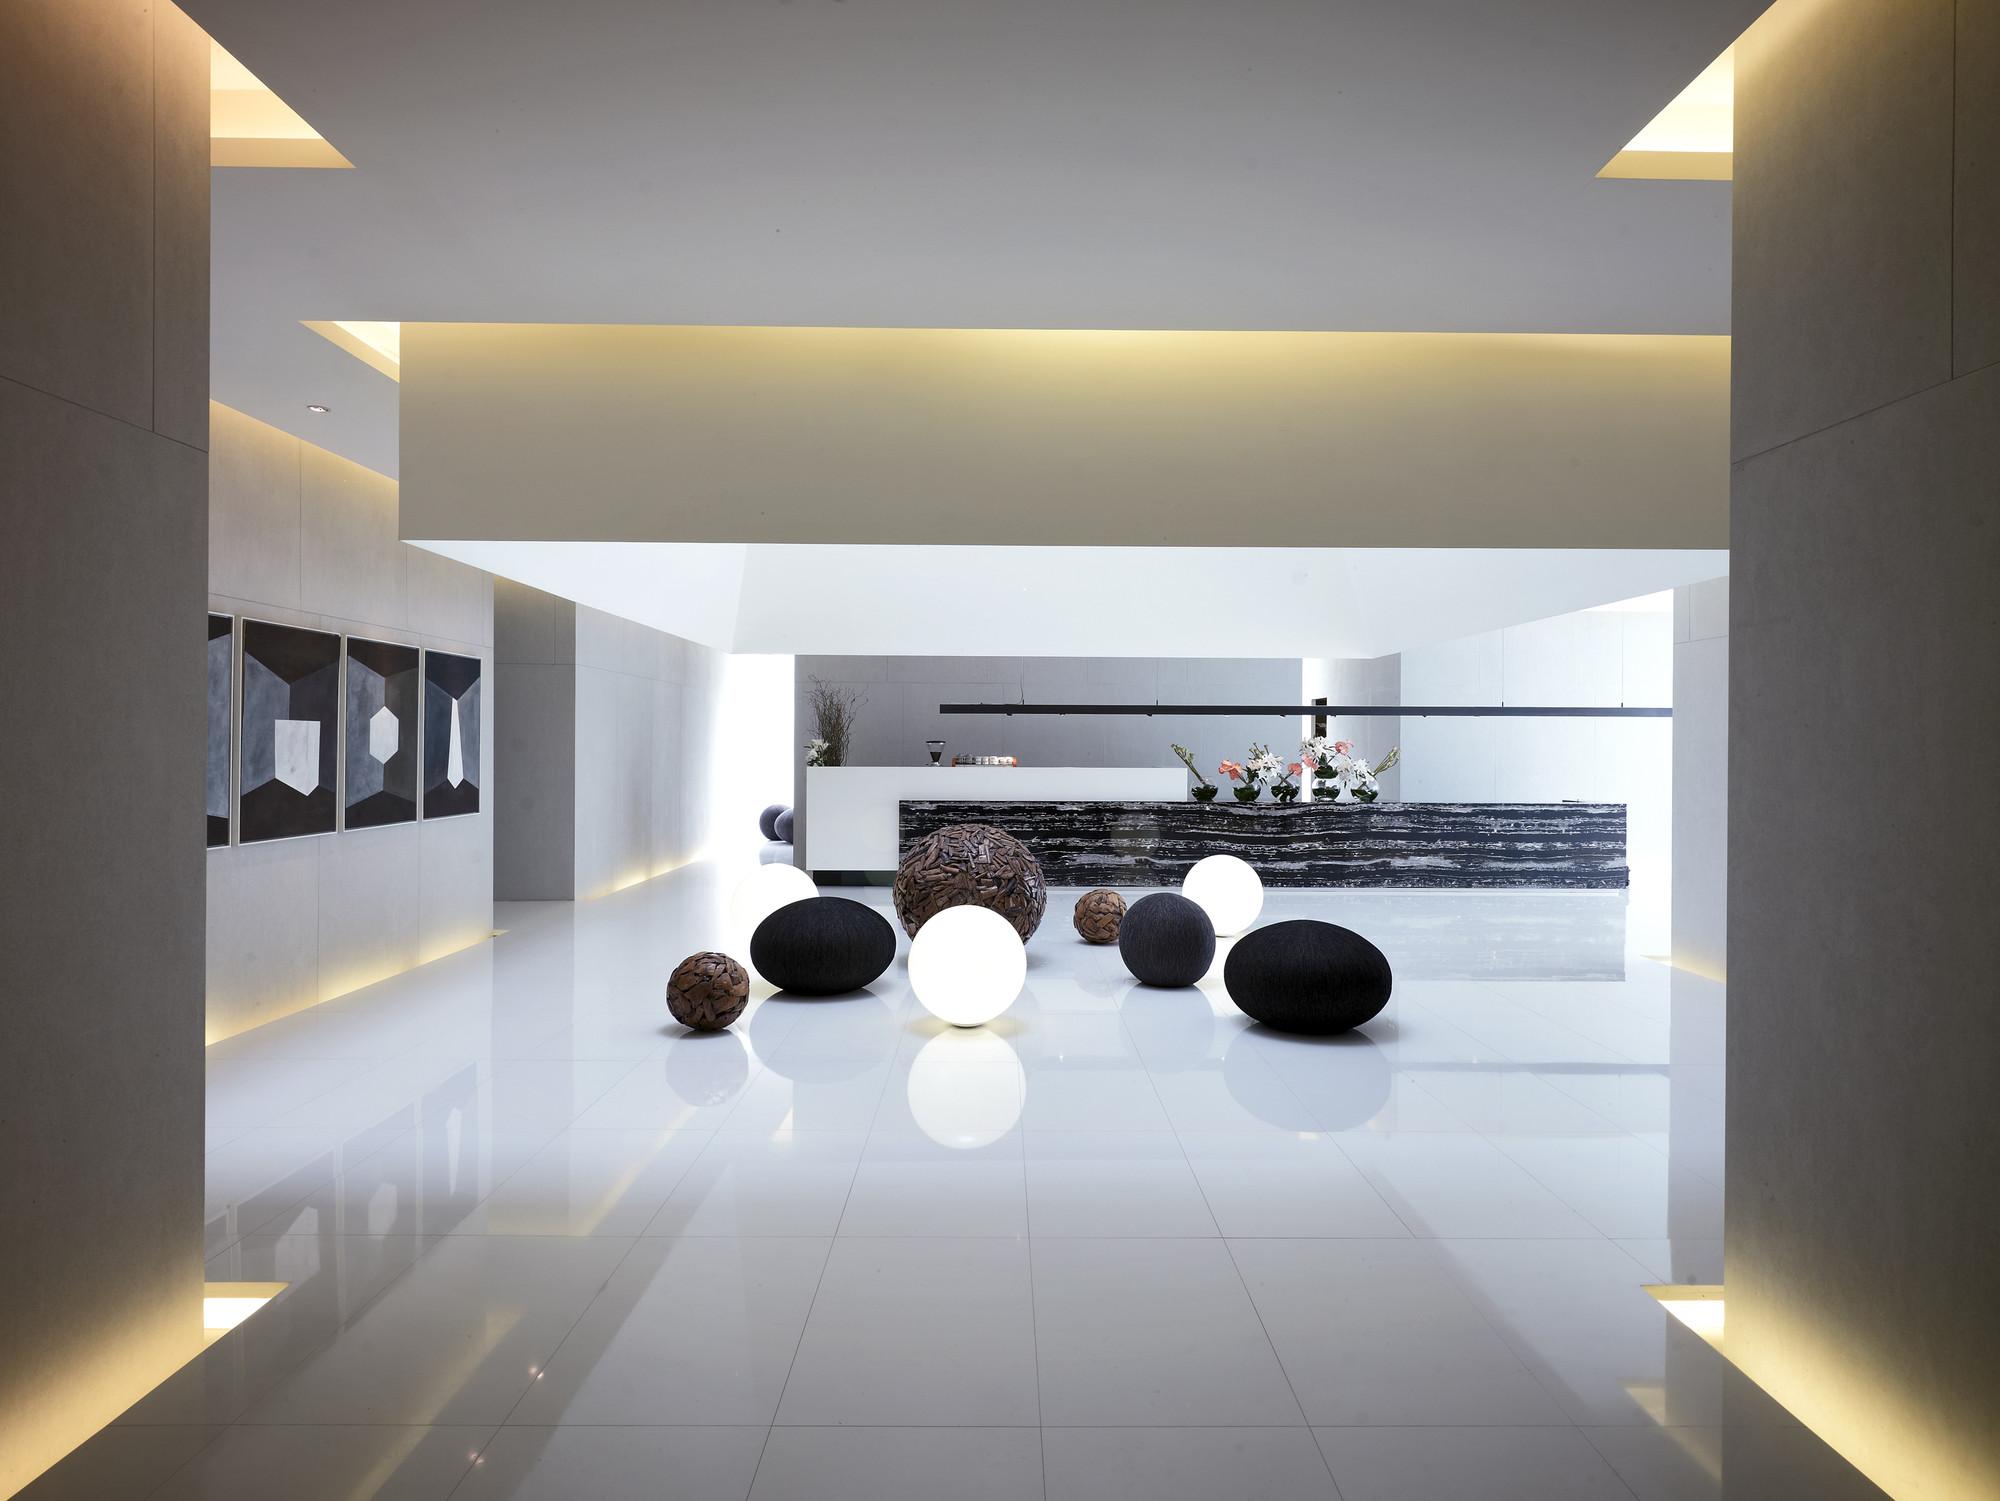 Gallery of lightbox hsuyuan kuo architect associates 20 for Architect associates